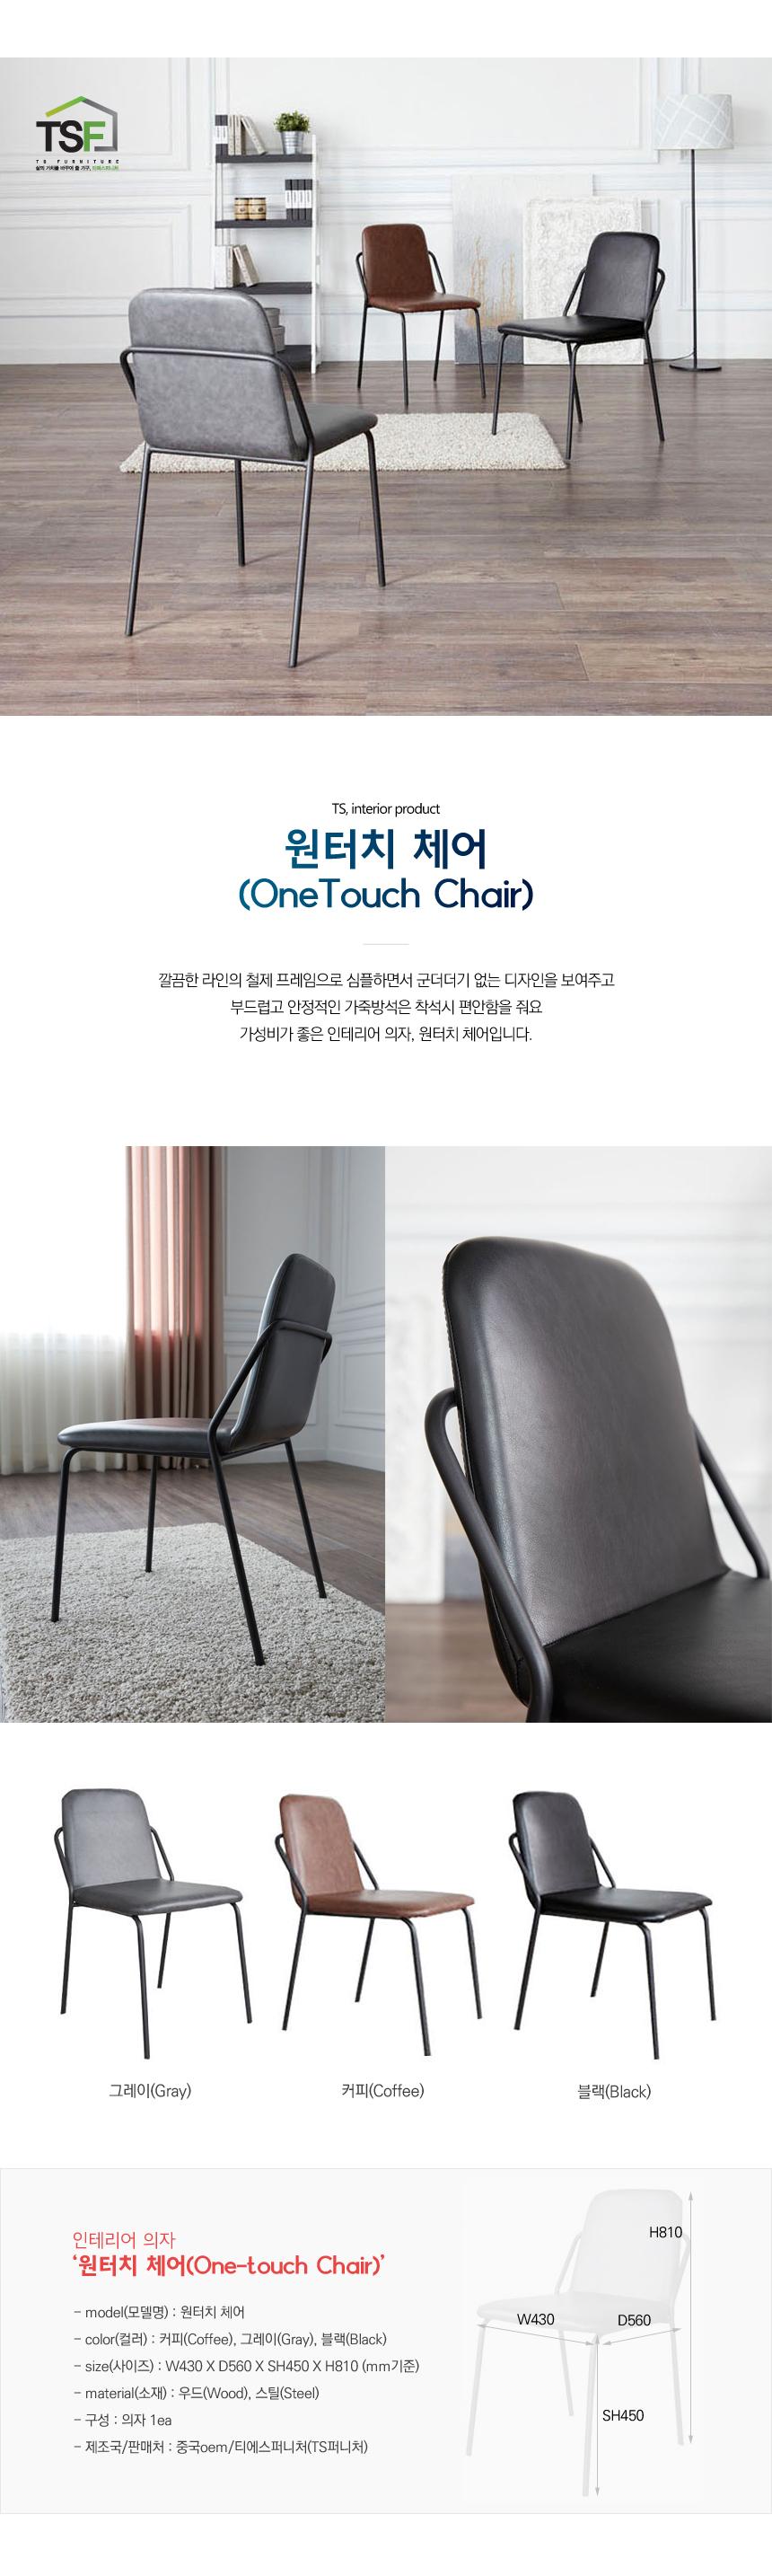 I 원터치 체어 카페 인테리어 식탁의자 - 티에스퍼니처, 65,200원, 식탁/의자, 식탁 의자